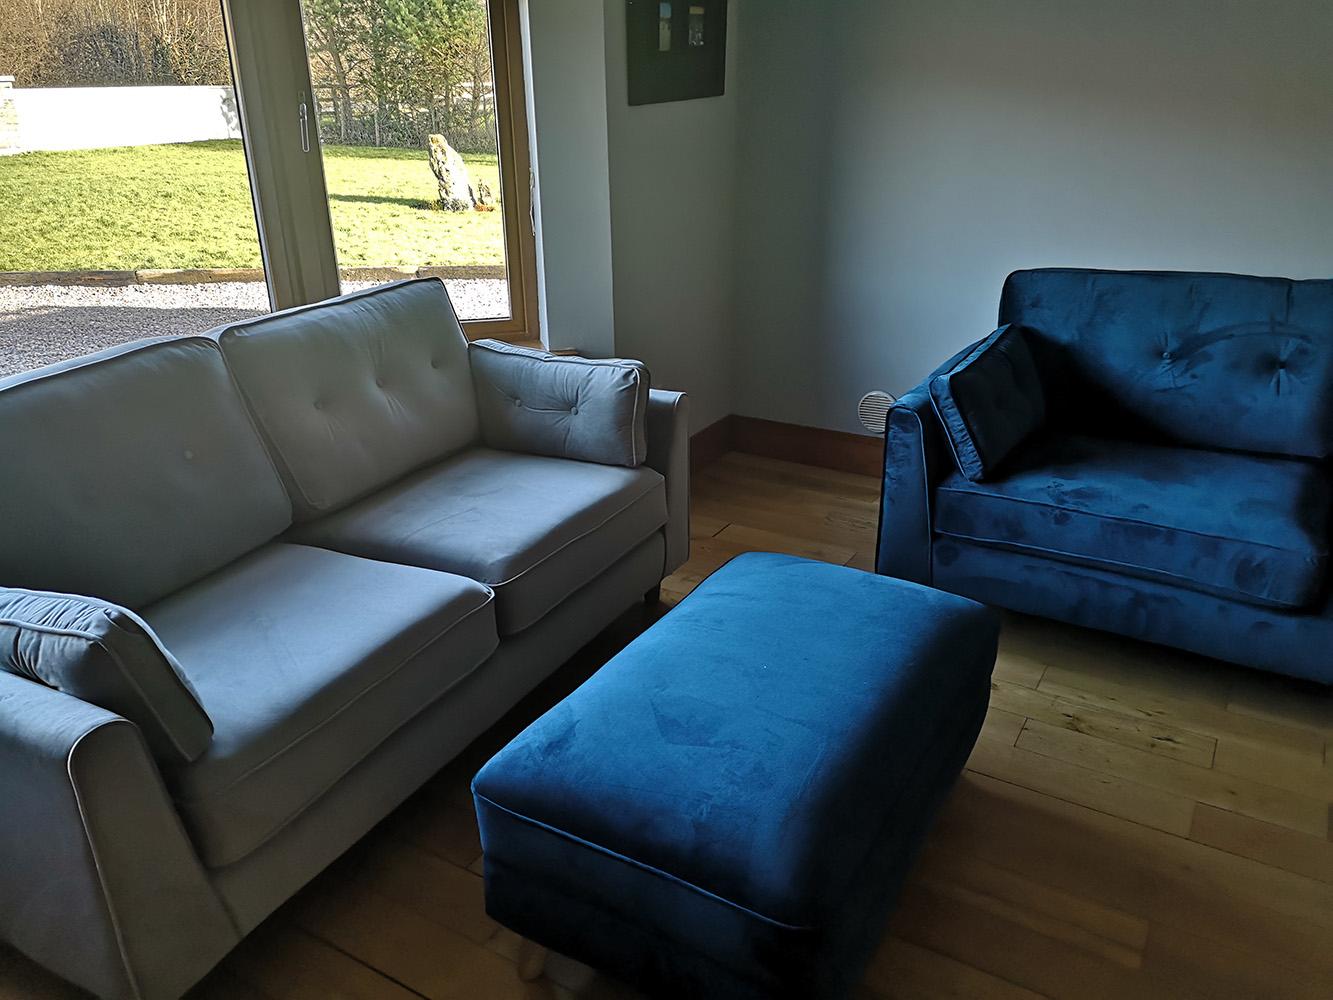 Light blue and navy Magnus sofa